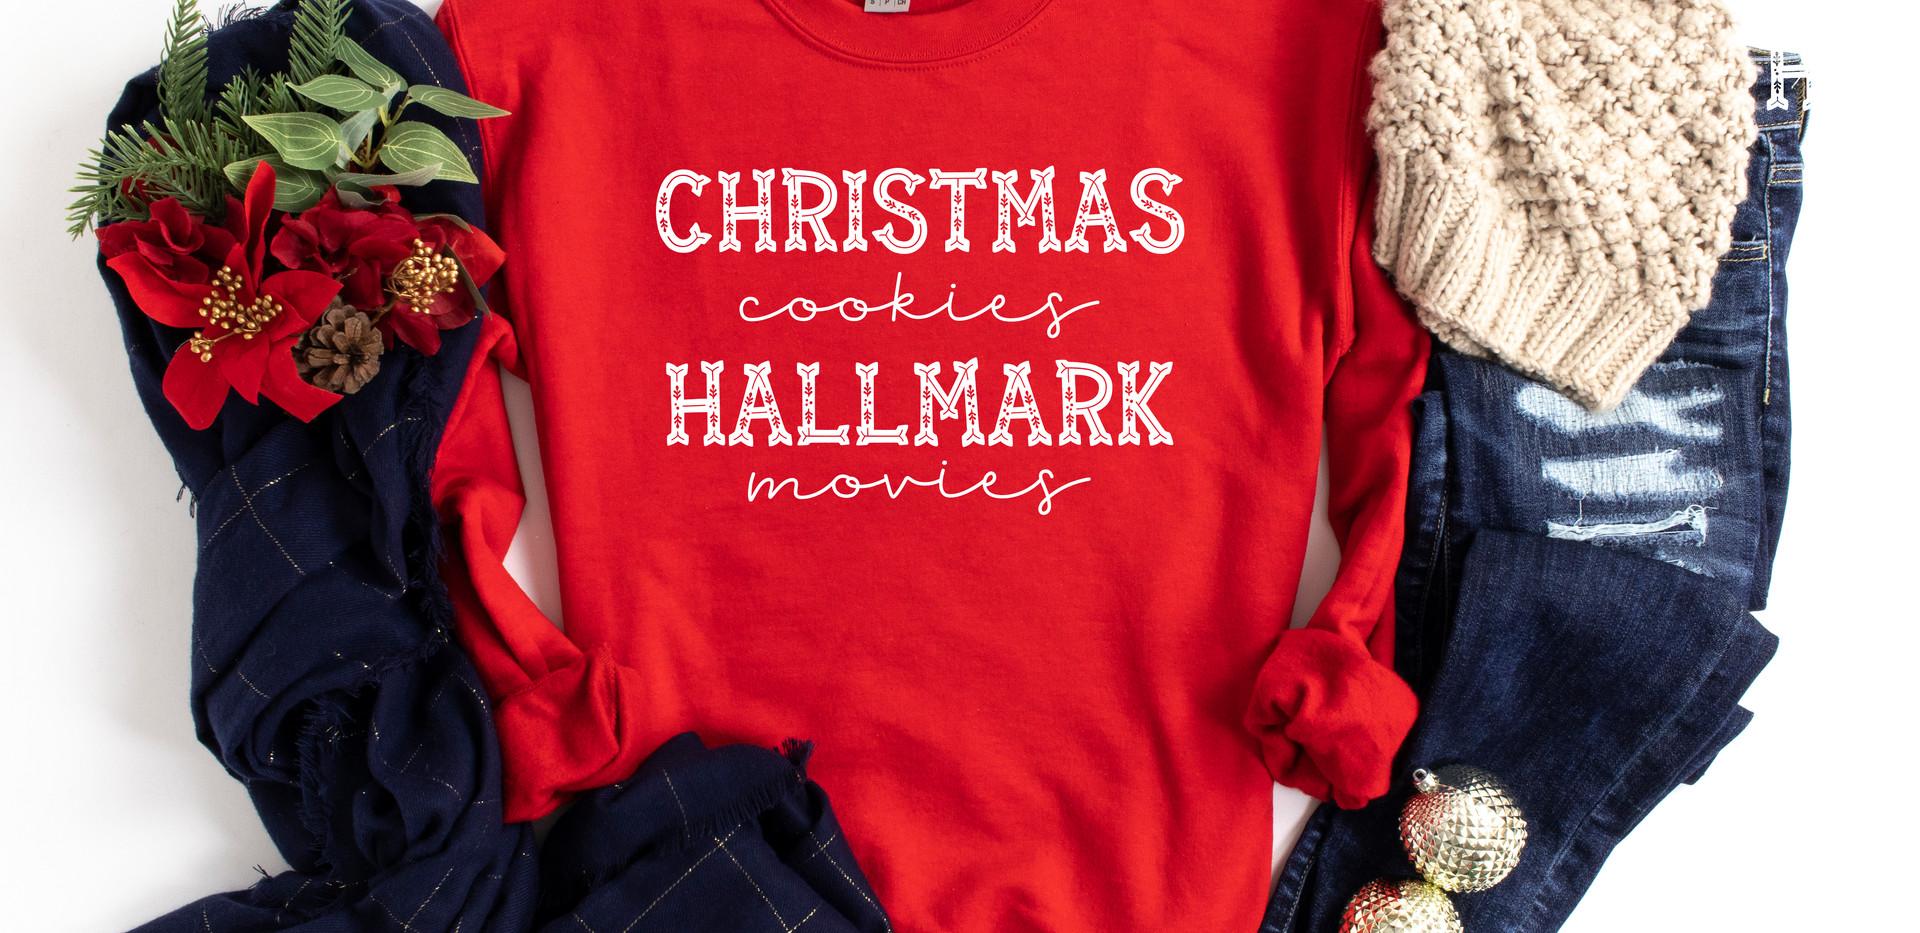 Christmas & Hallmark